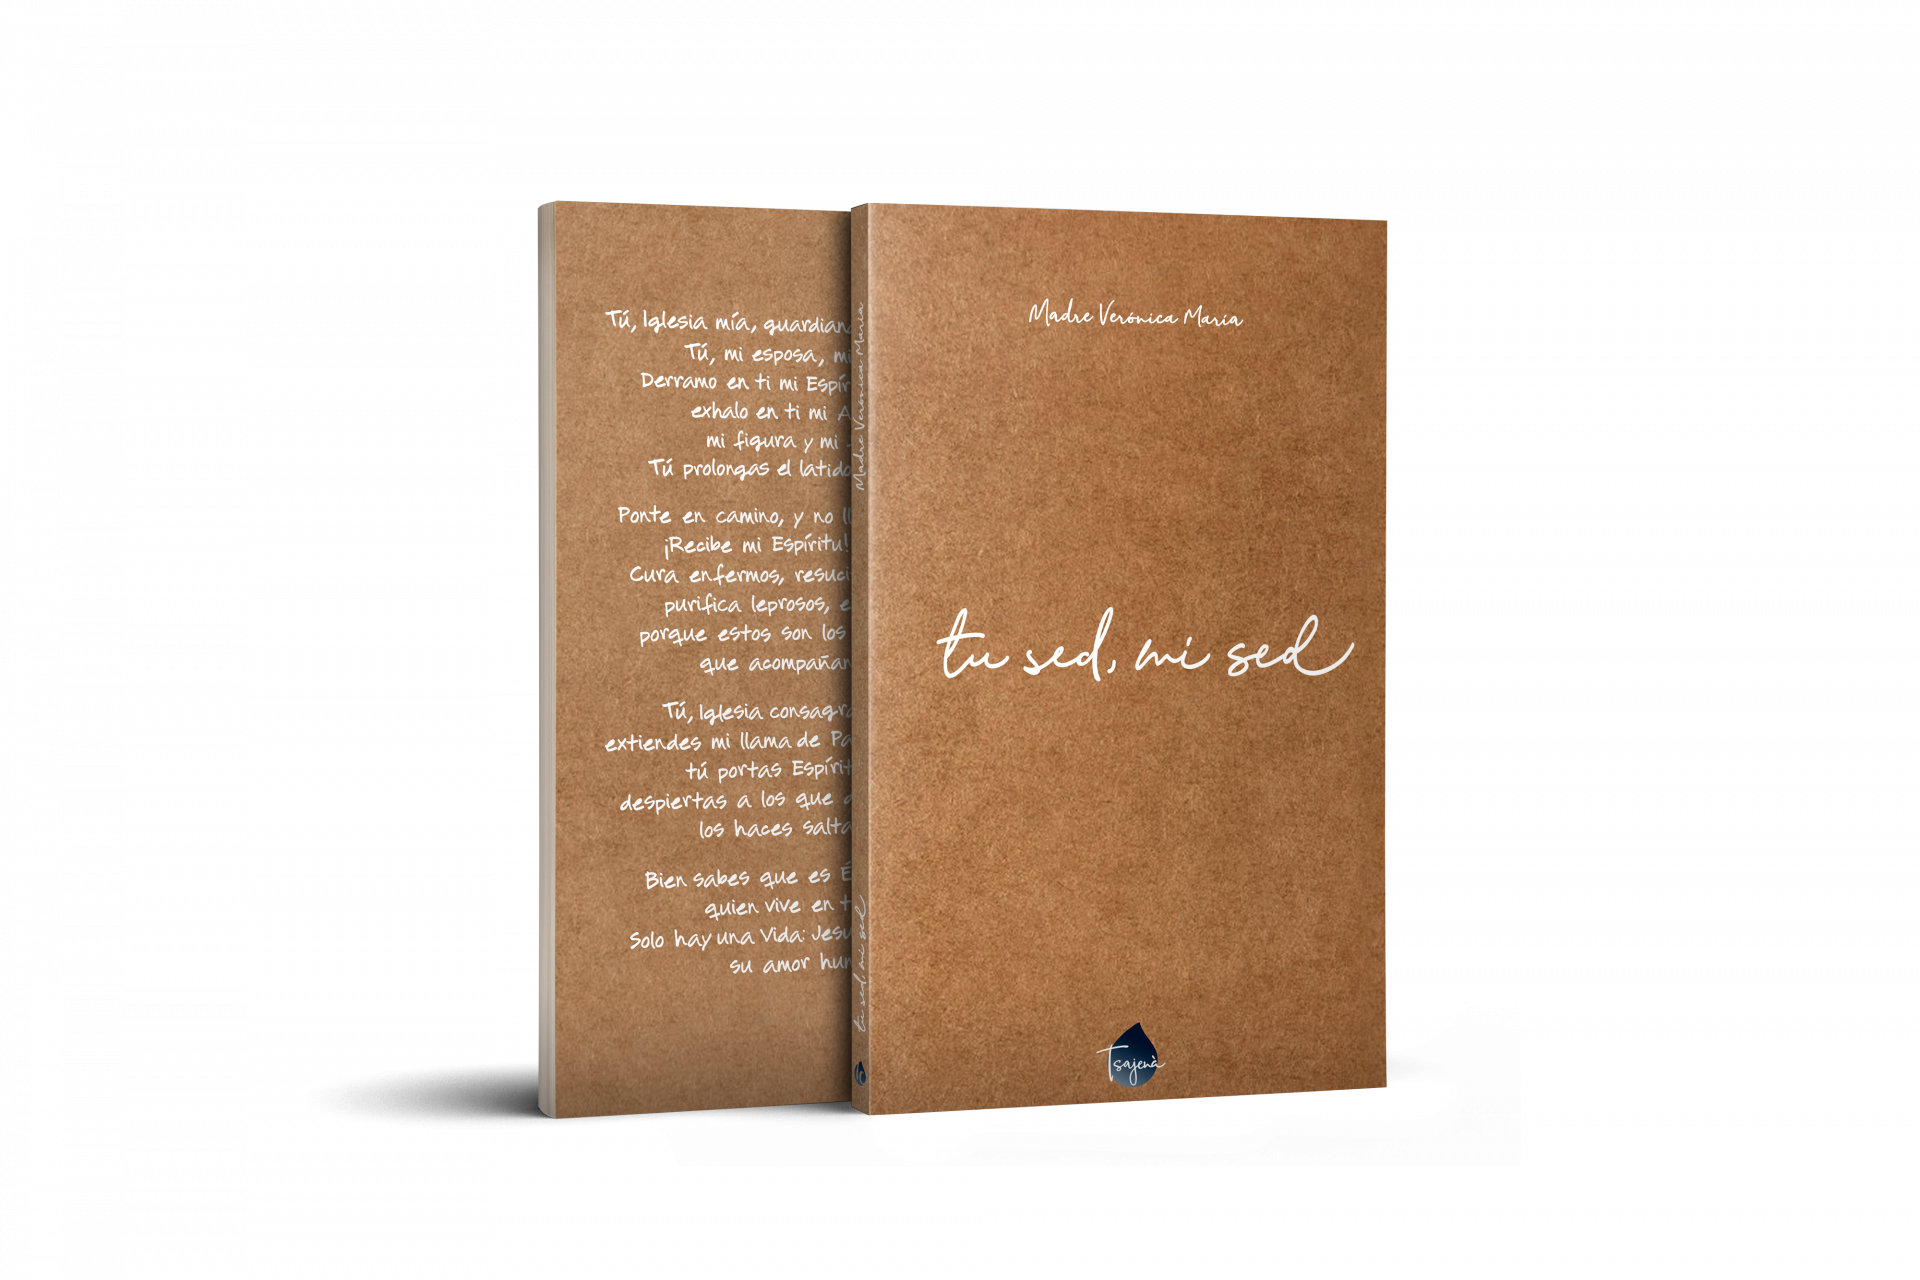 Plantilla-Front-Back-Book-TU-SED-MI-SED-1600170004.png